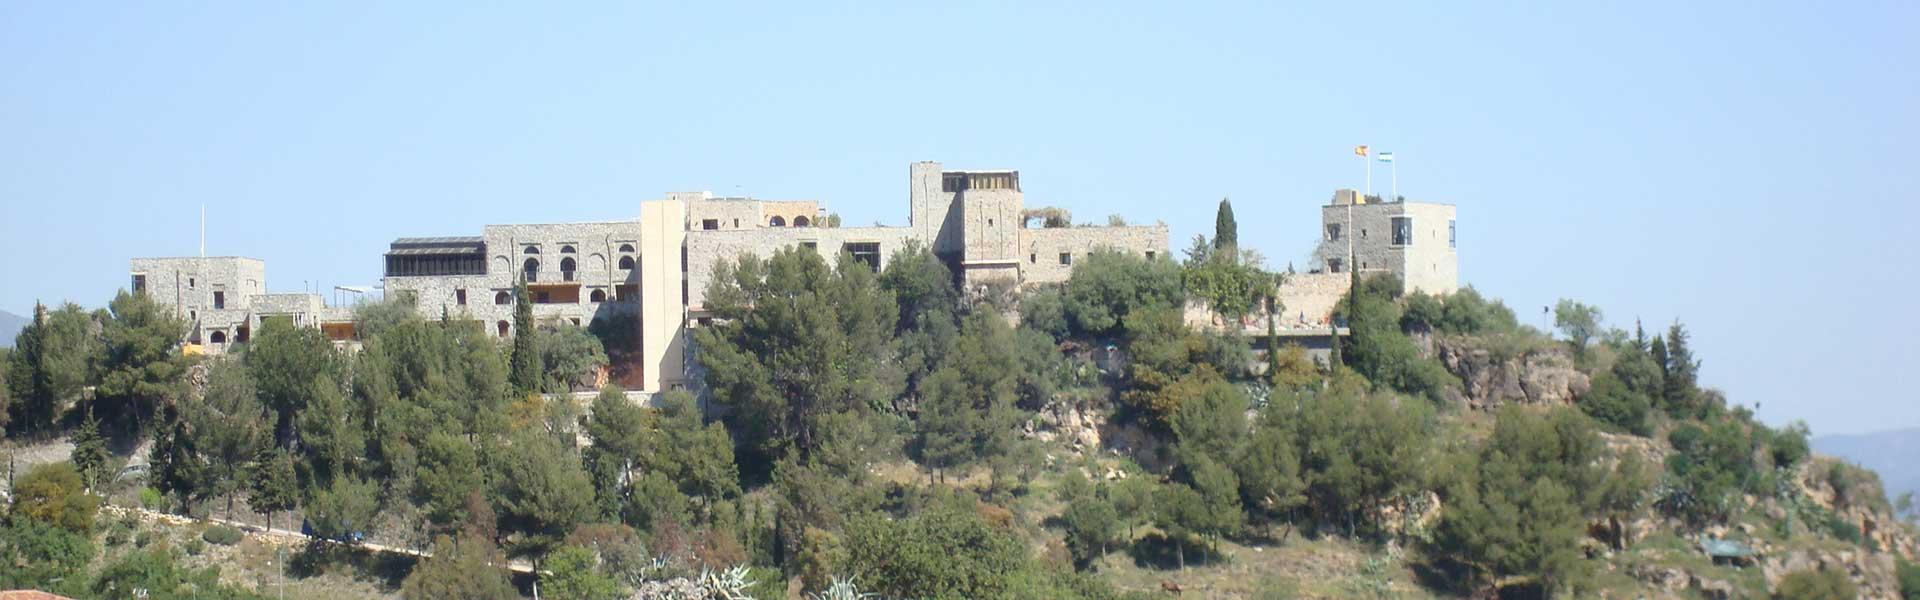 monda castle